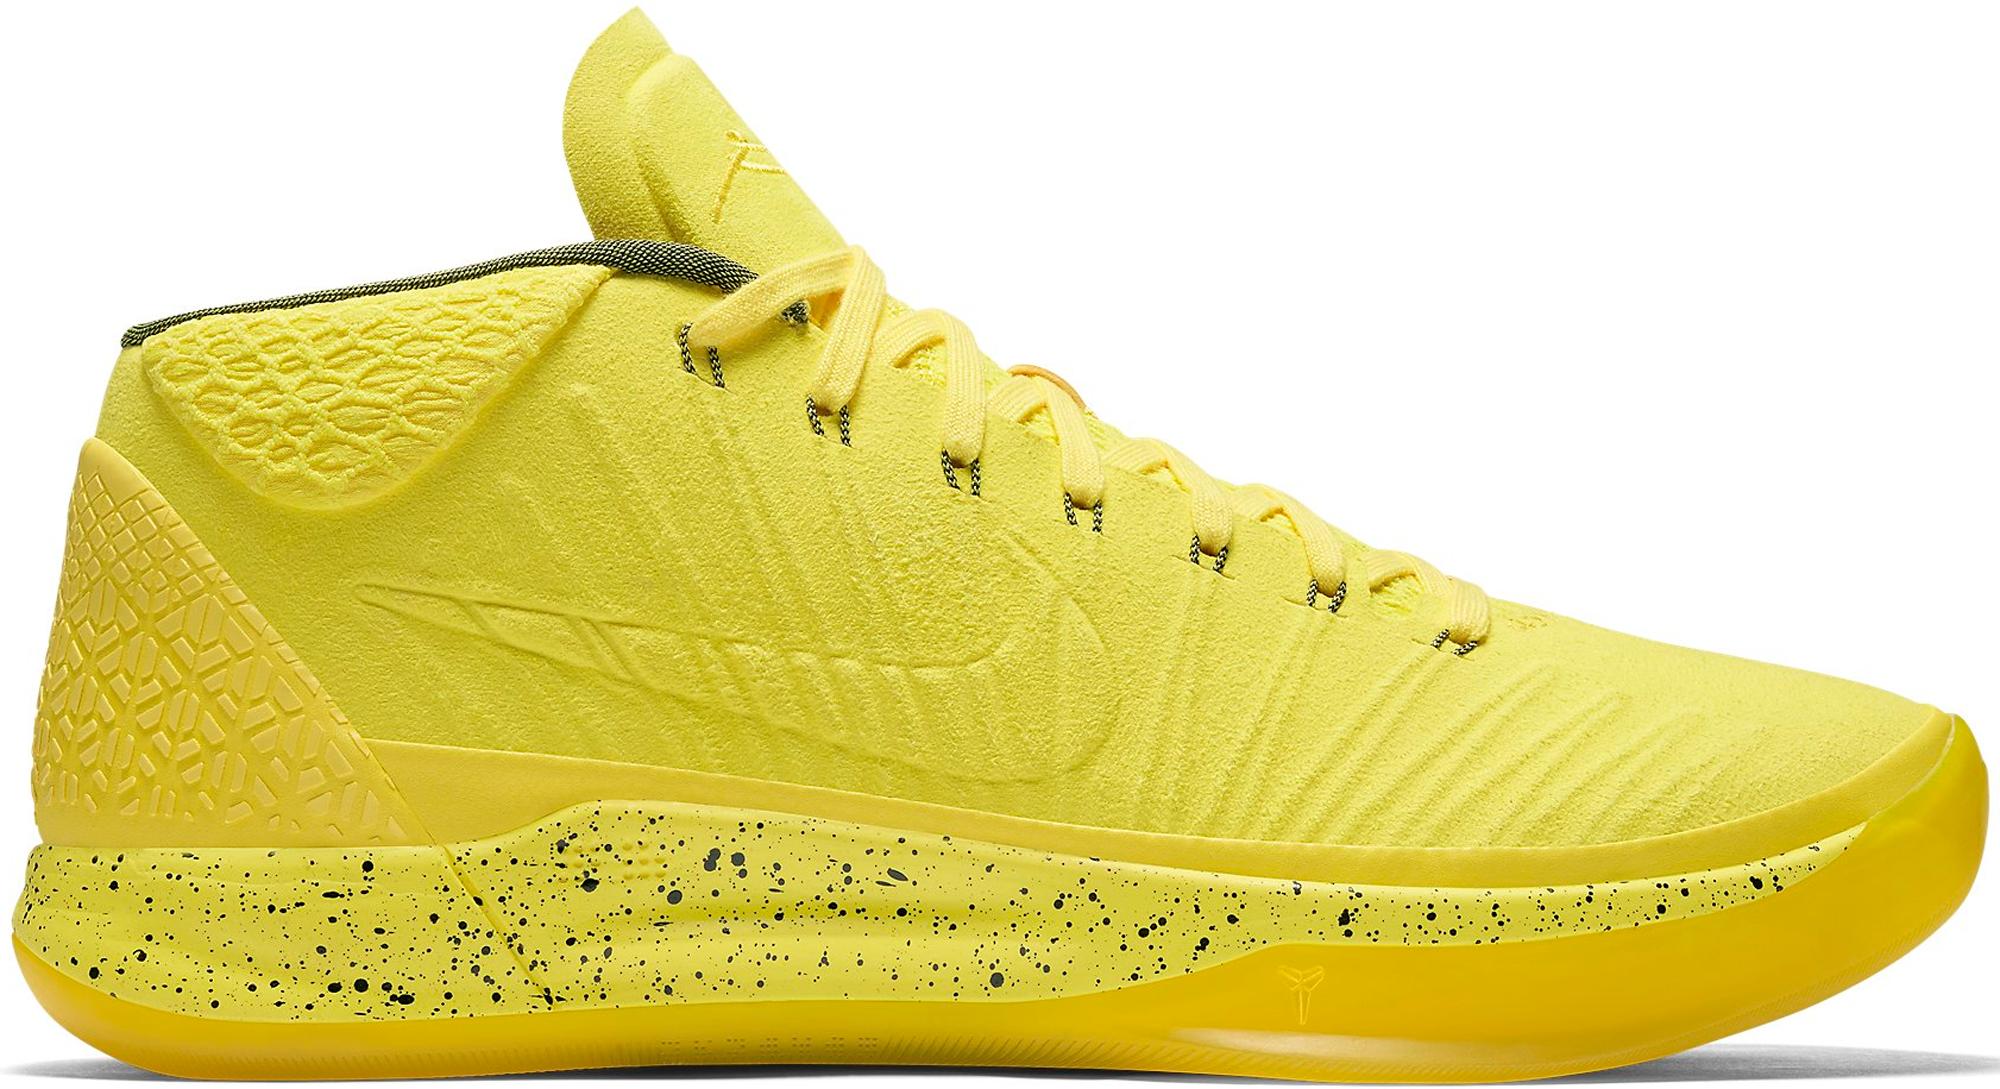 Nike Kobe A.D. Optimism - 922482-700